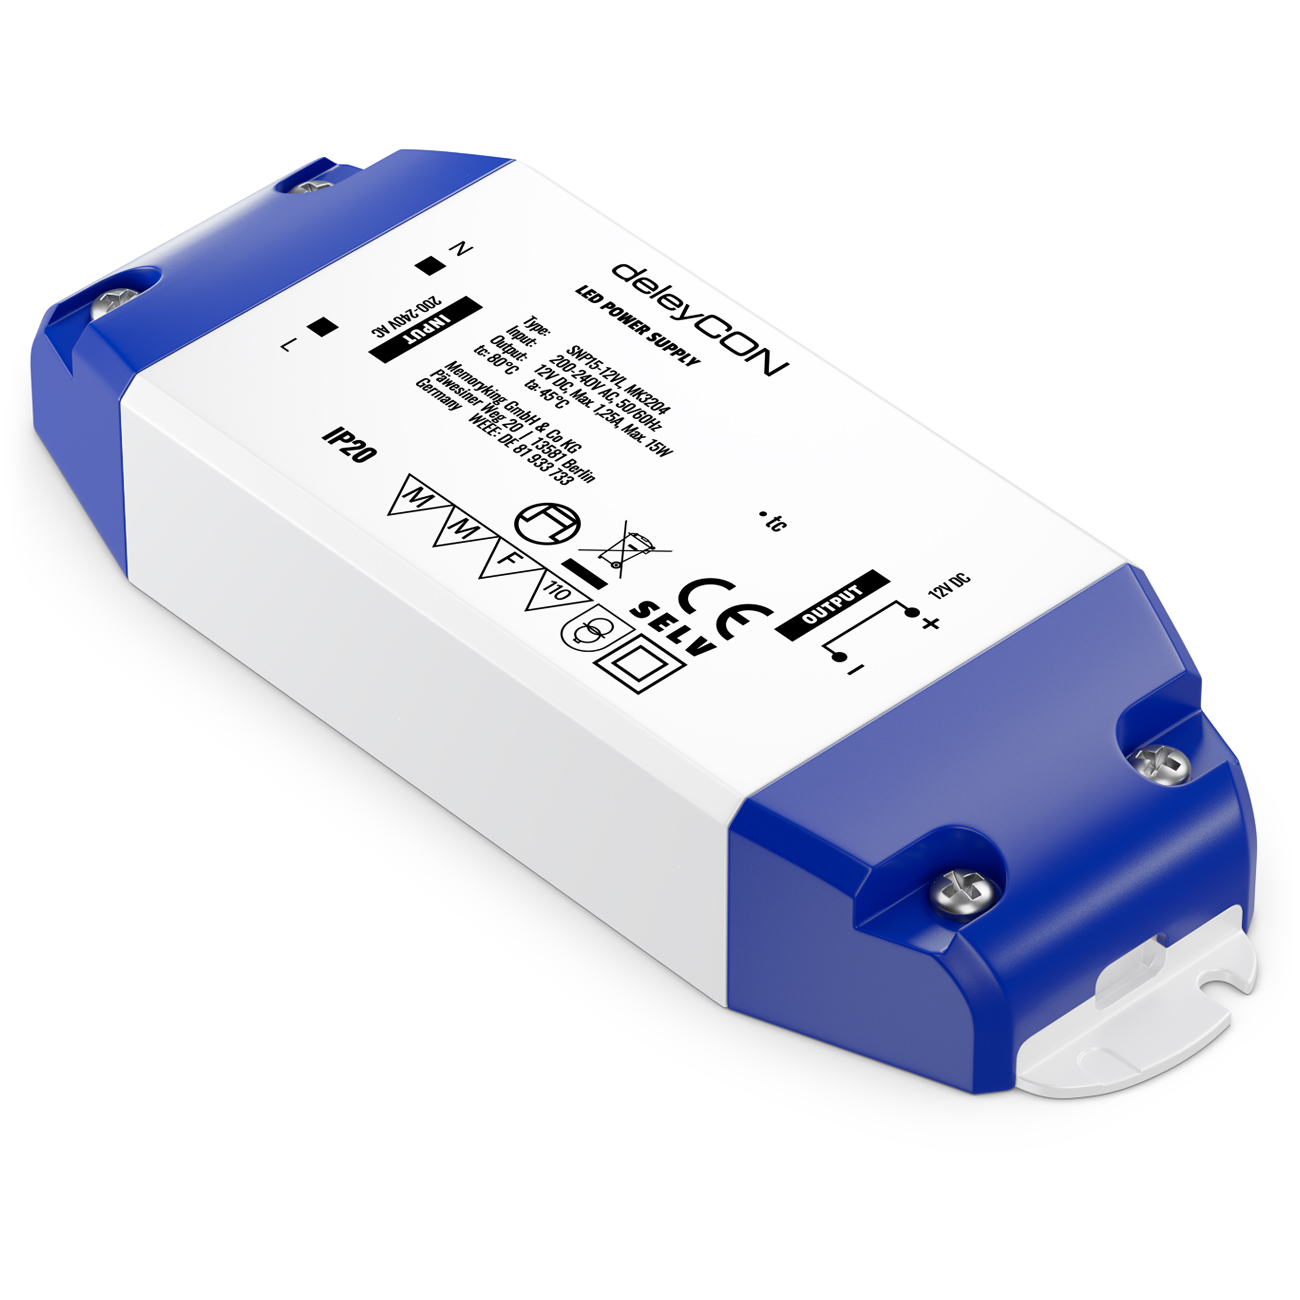 LED Transformator Trafo Konverter 5W 15W DC 12V Netzteil Treiber für LED G4